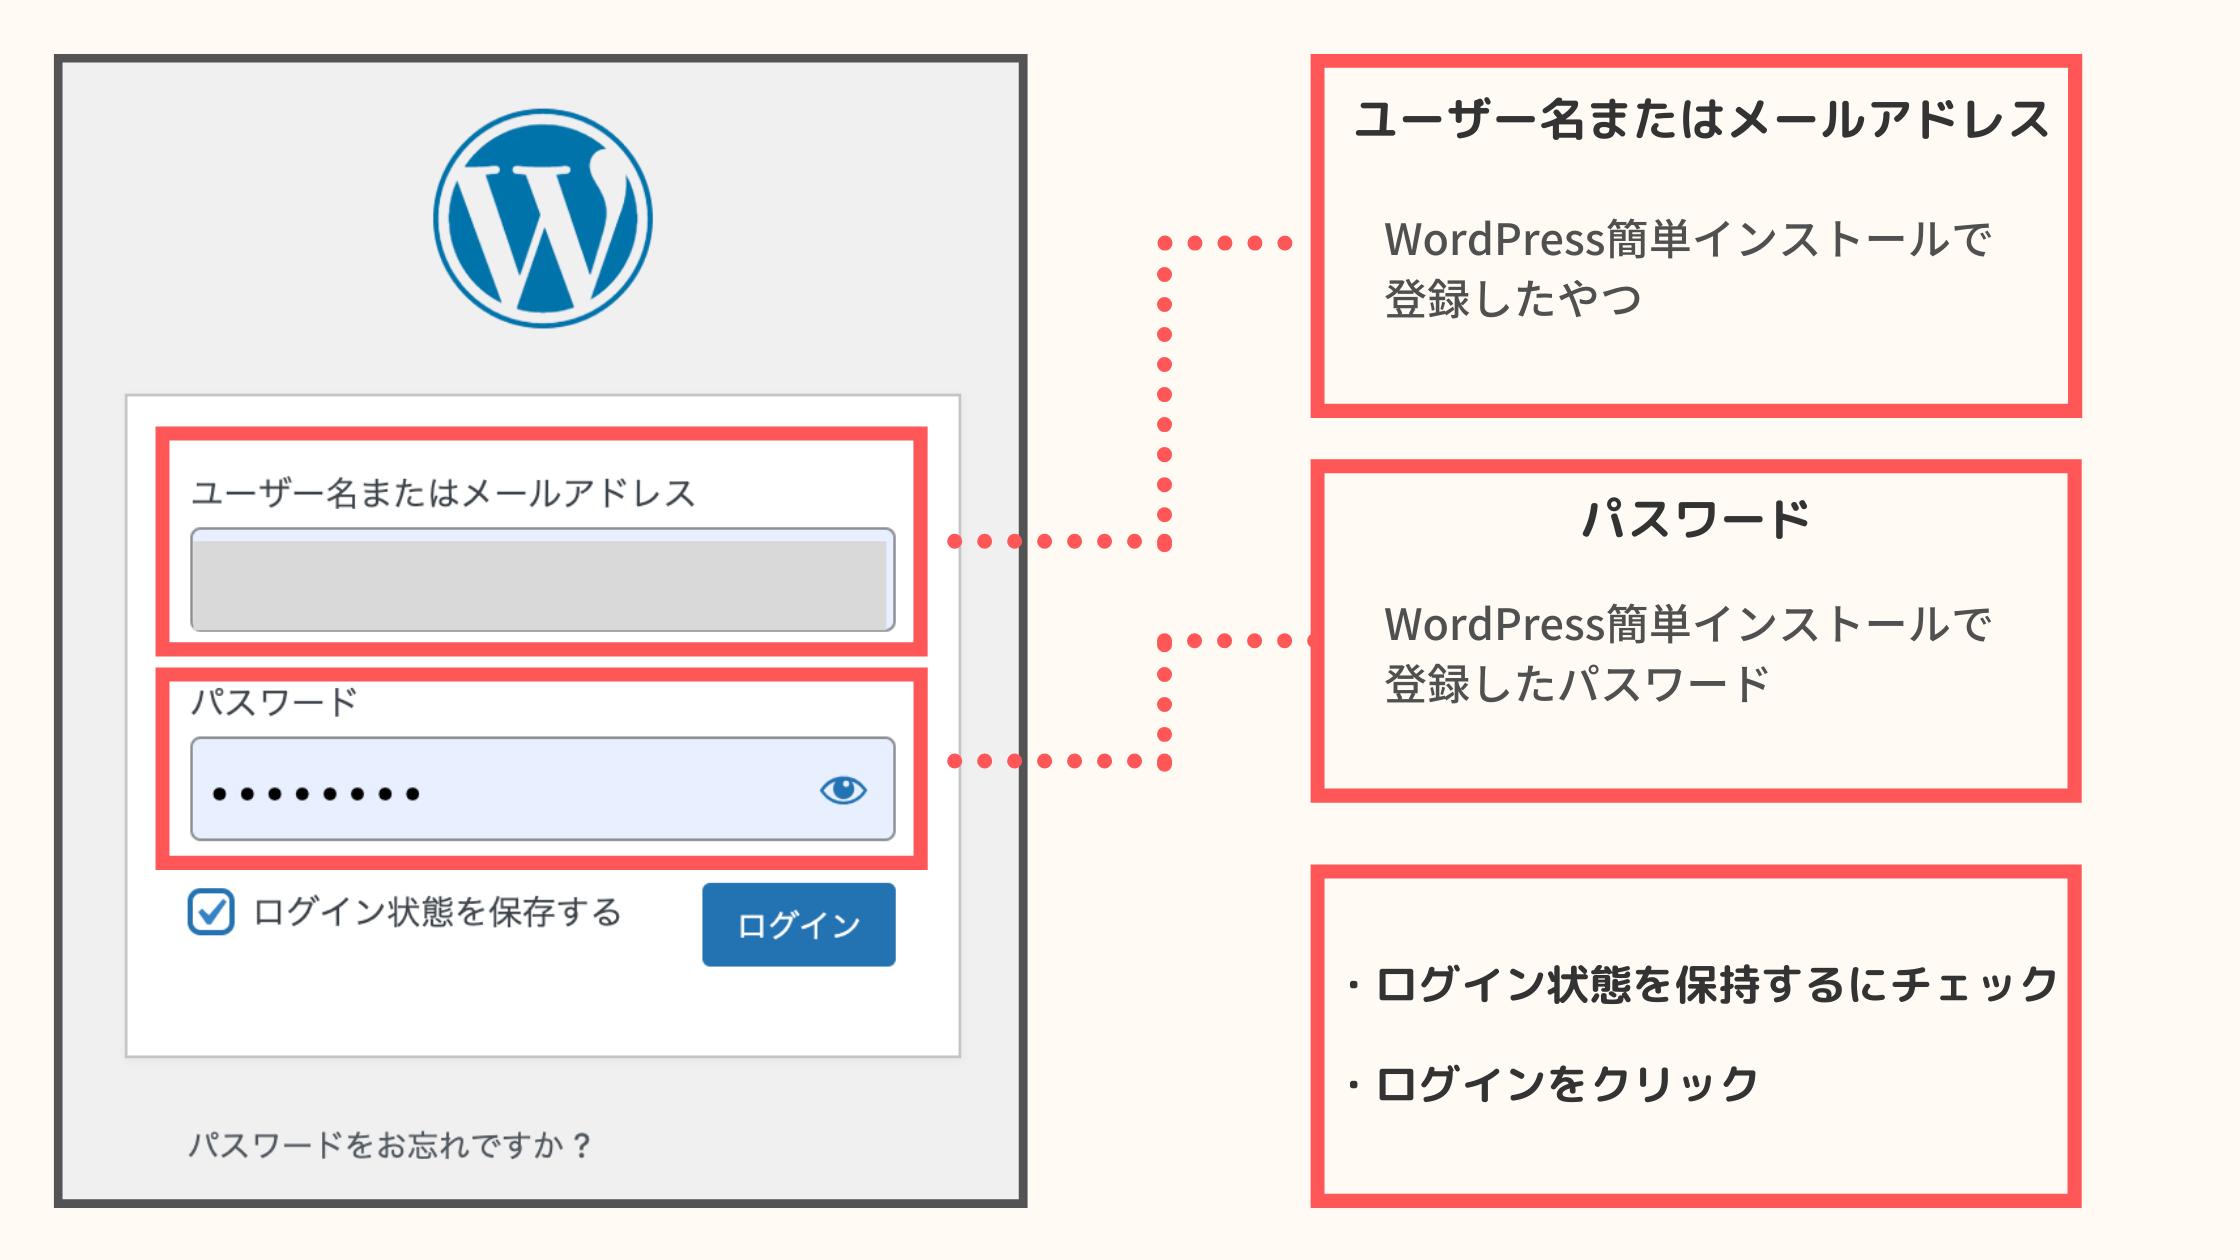 4. WordPressにログイン